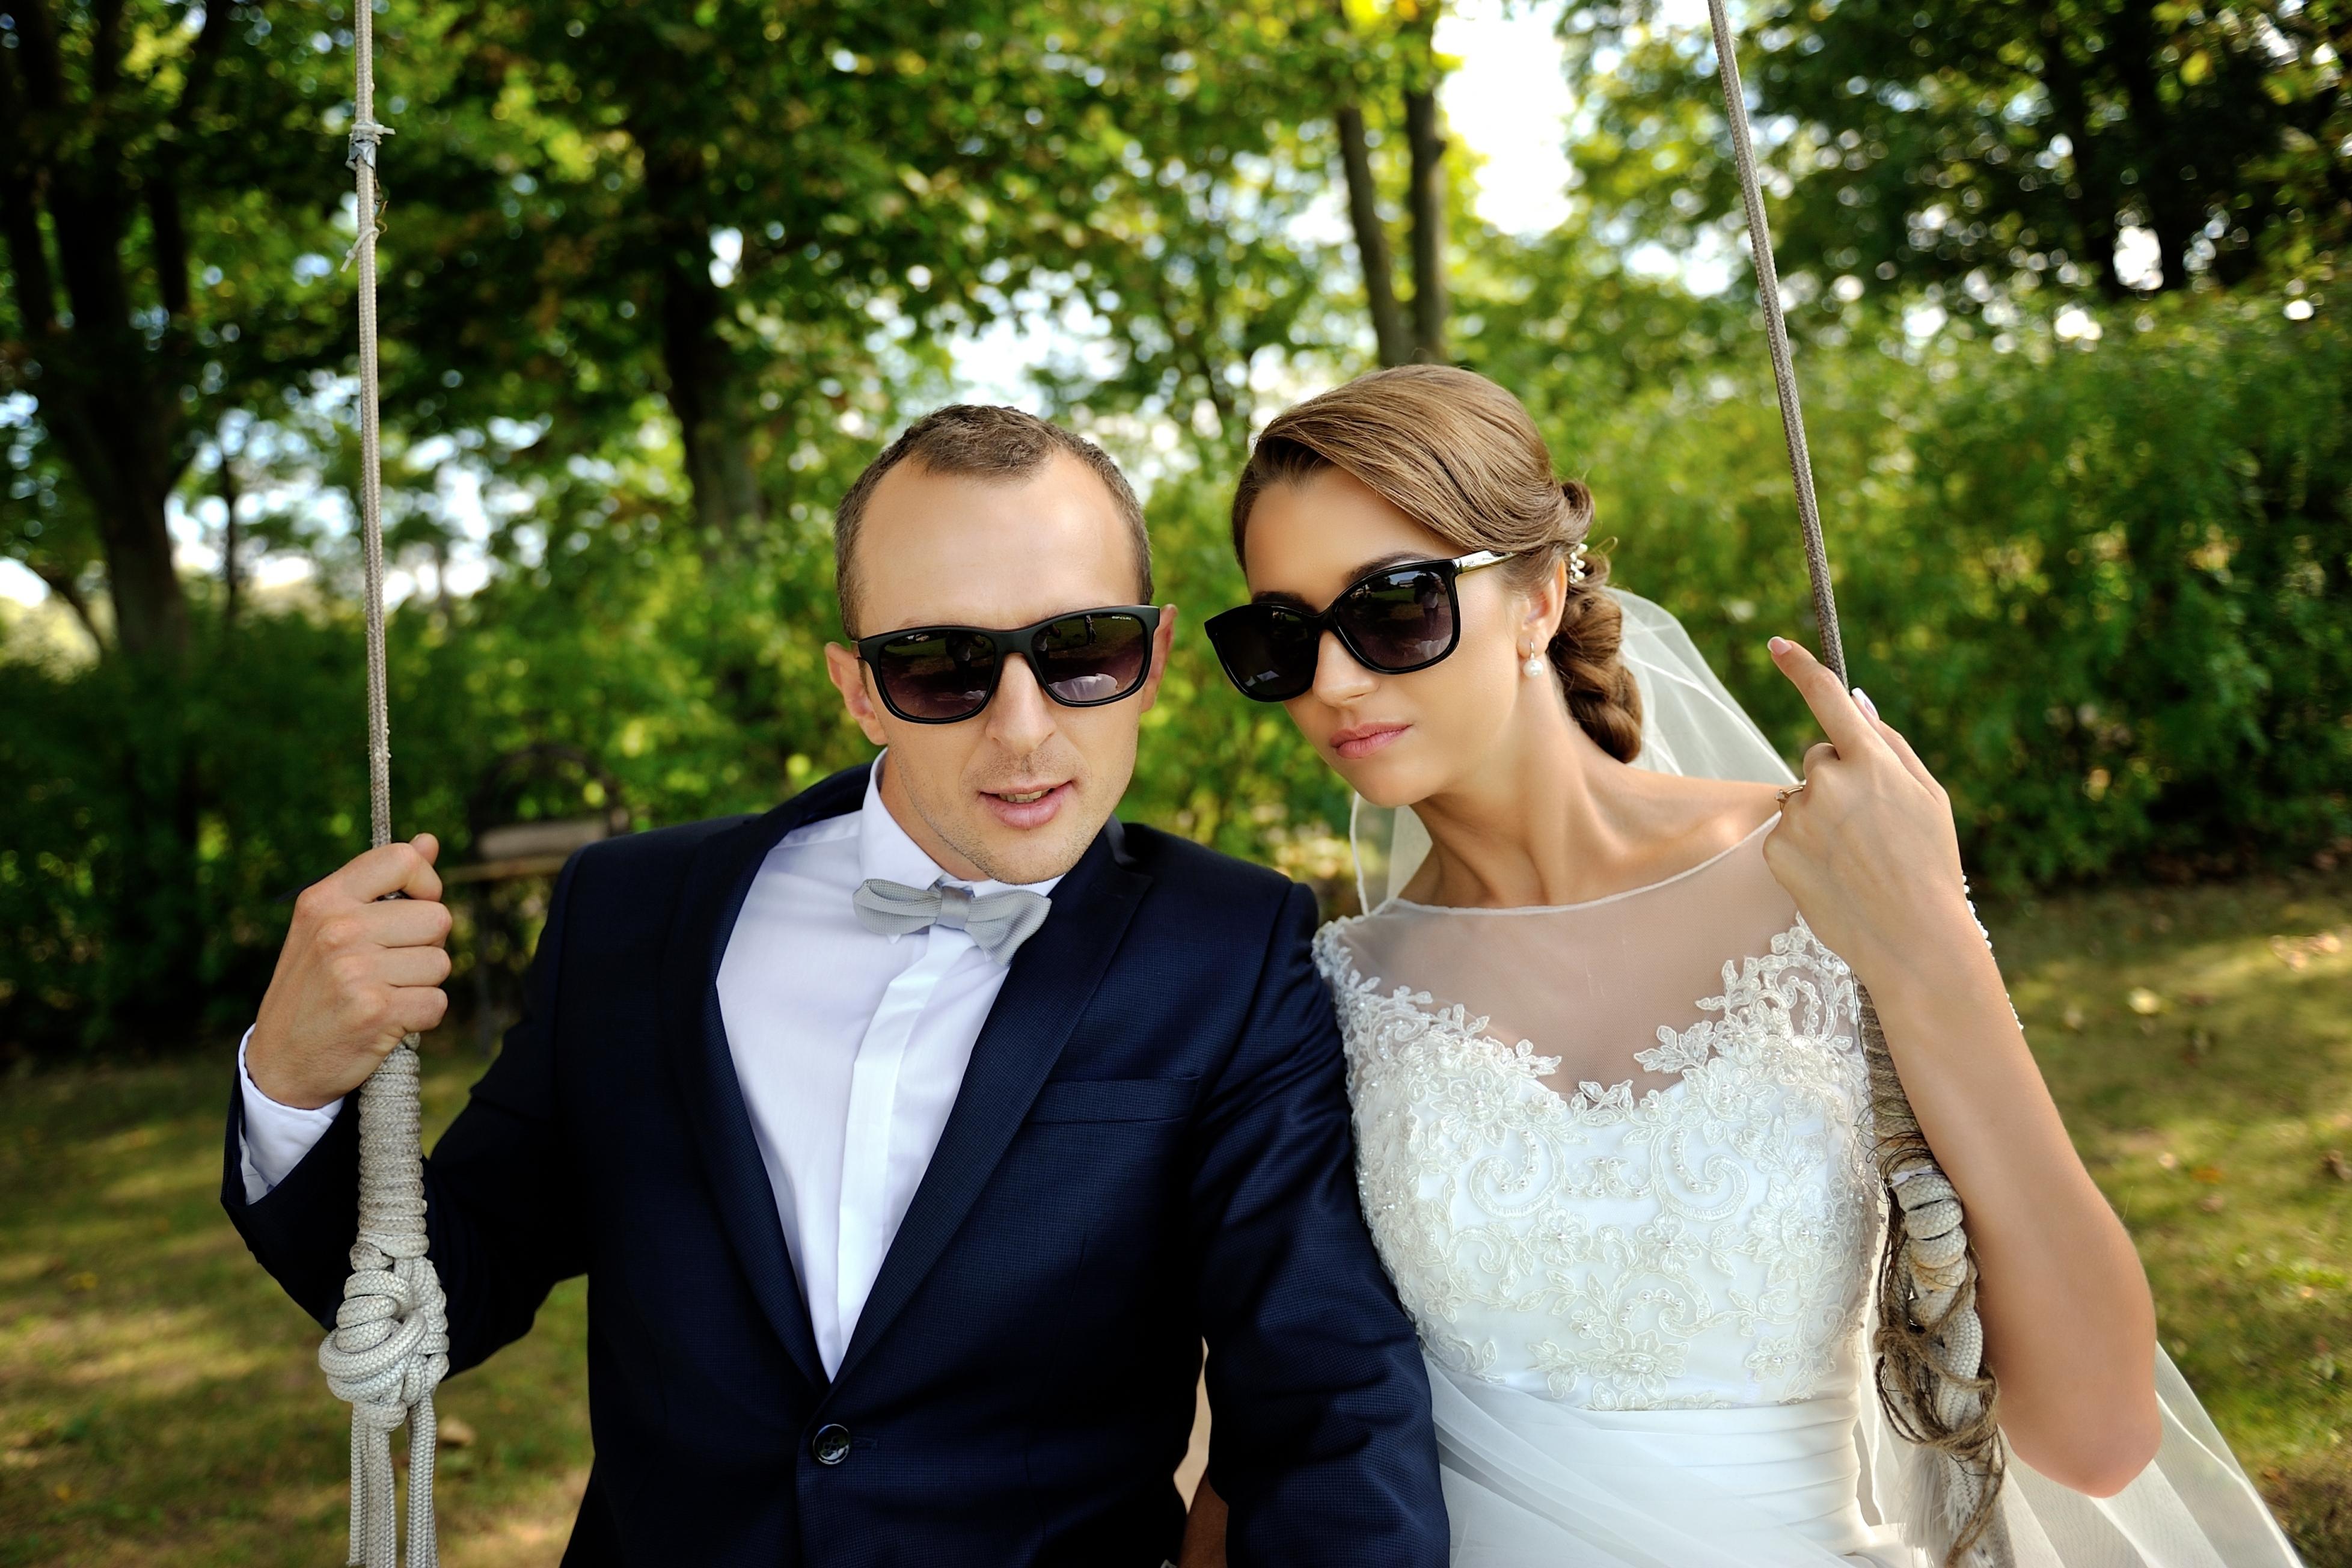 Fotogeniškumas vestuvėse